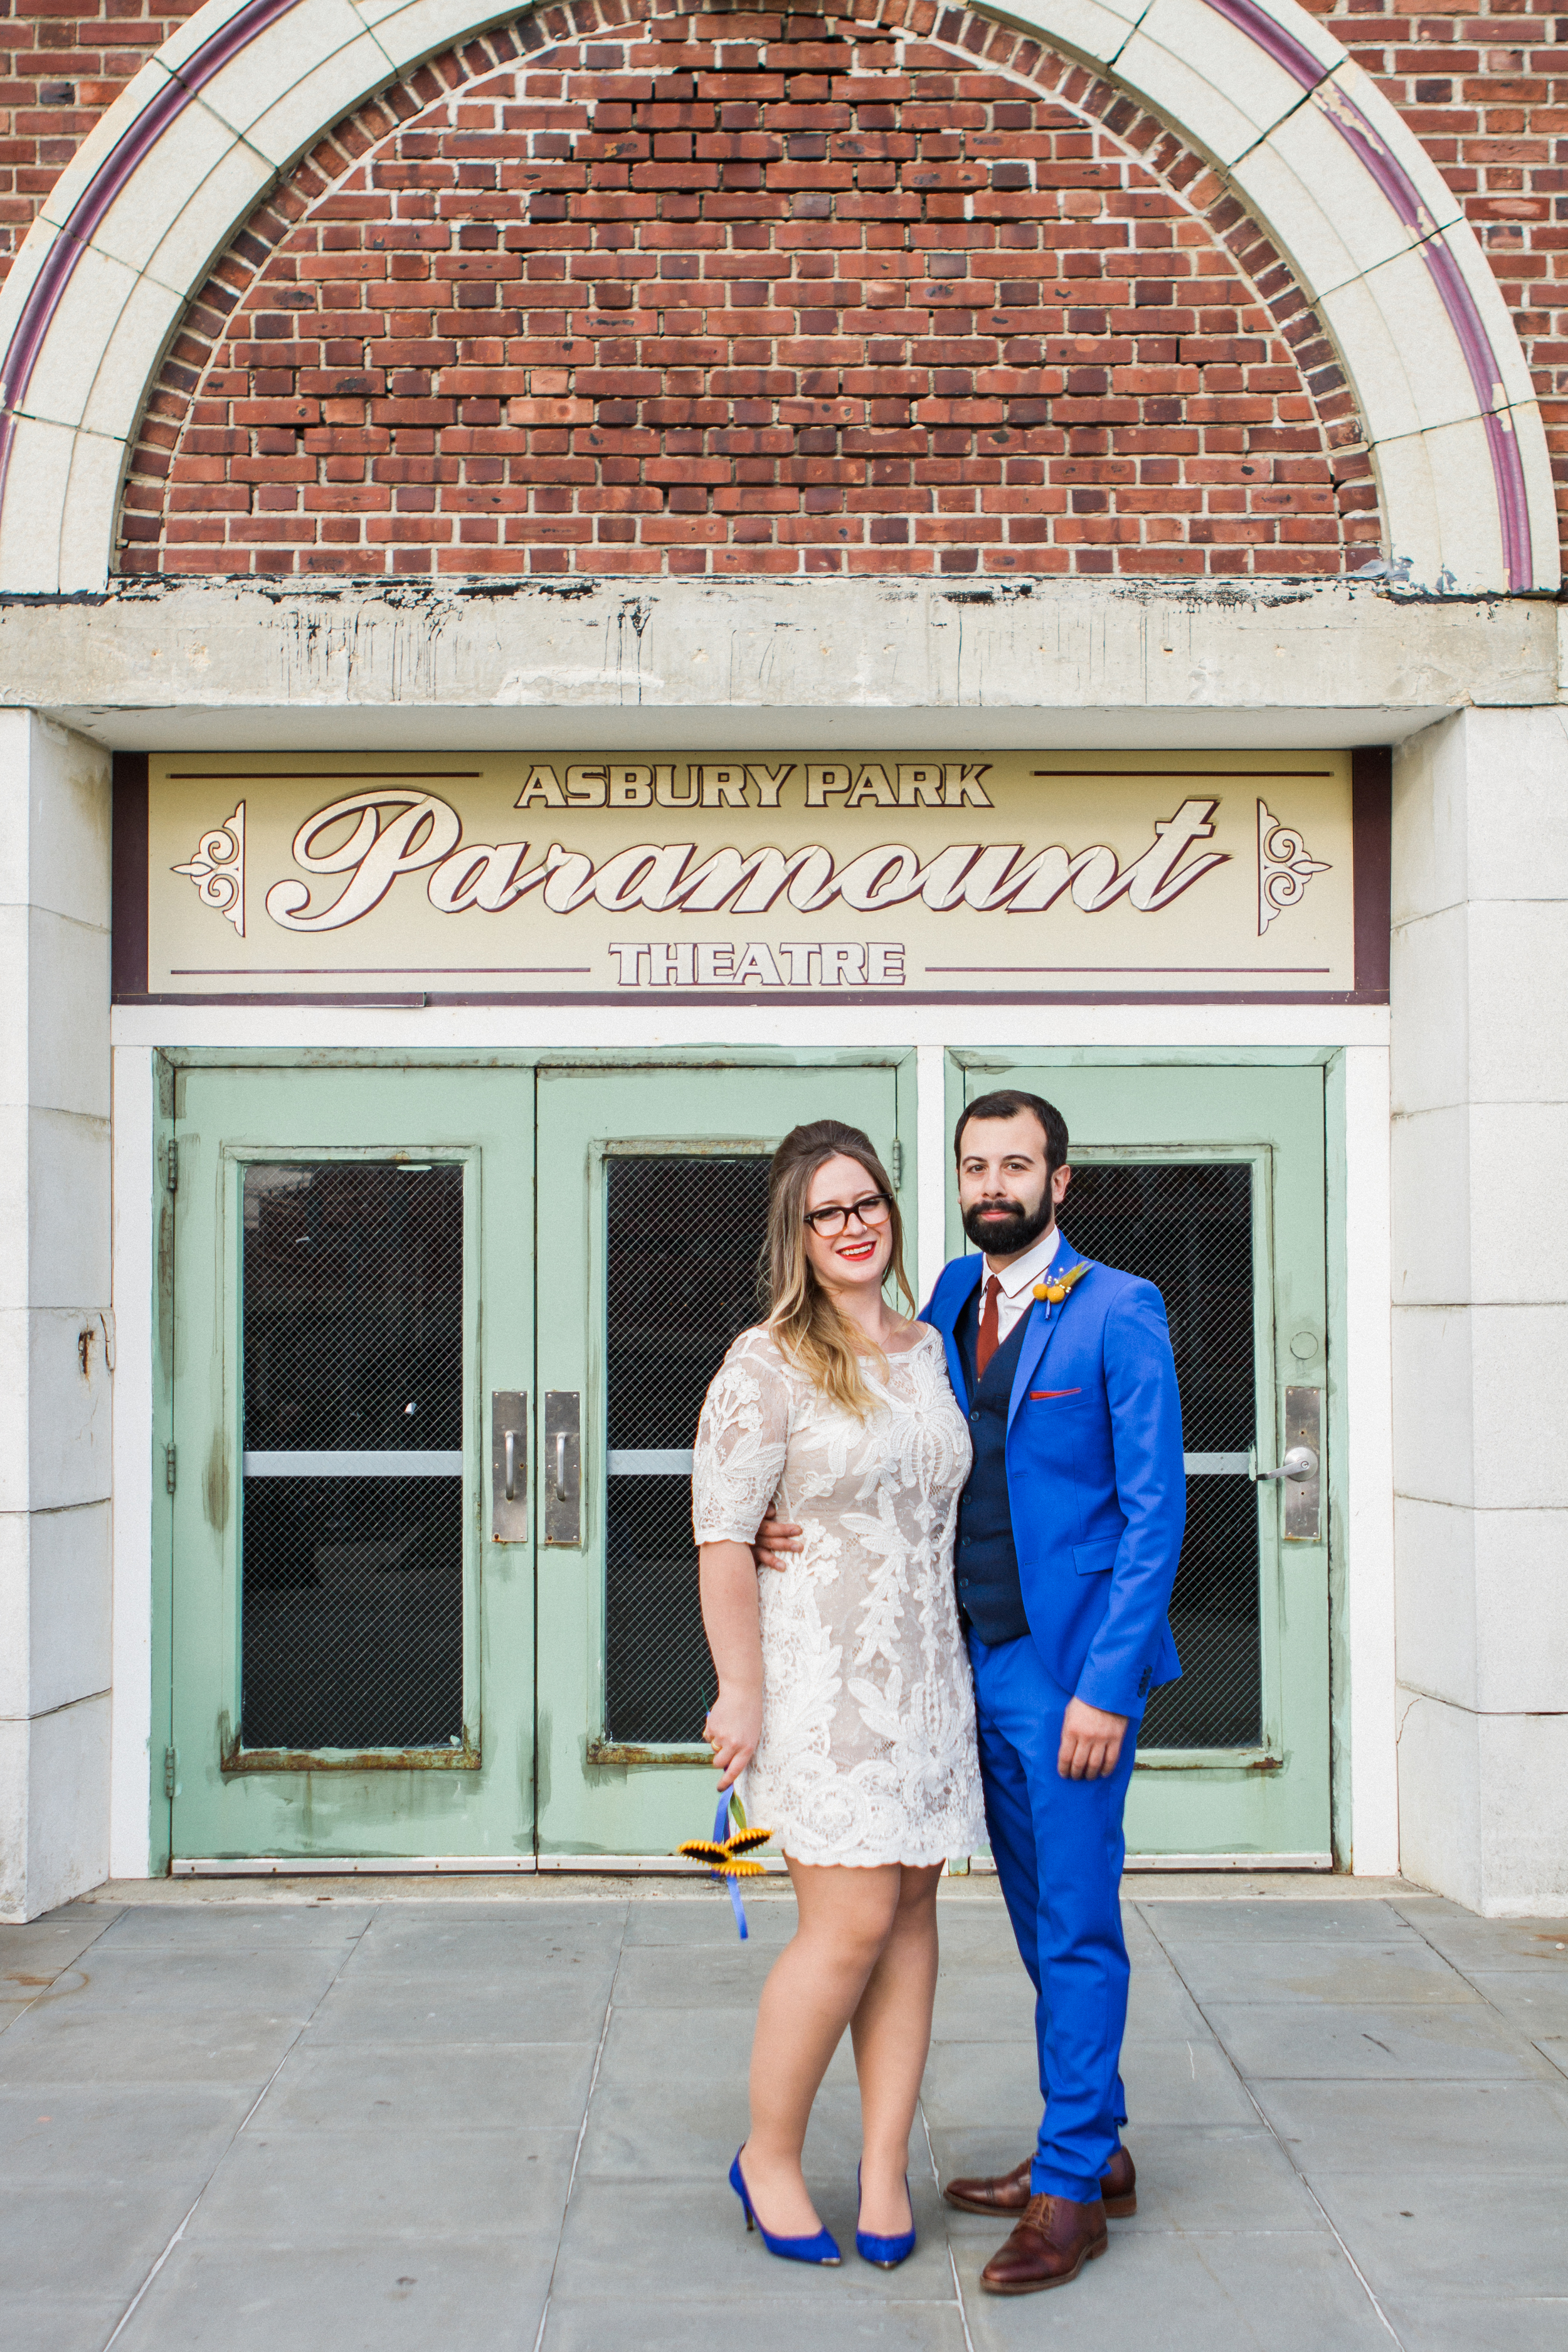 Victoria and Nick Asbury Park Boardwalk Tim McLoone's Supper Club New Jersey Shore Wedding Shannon Sorensen Photography